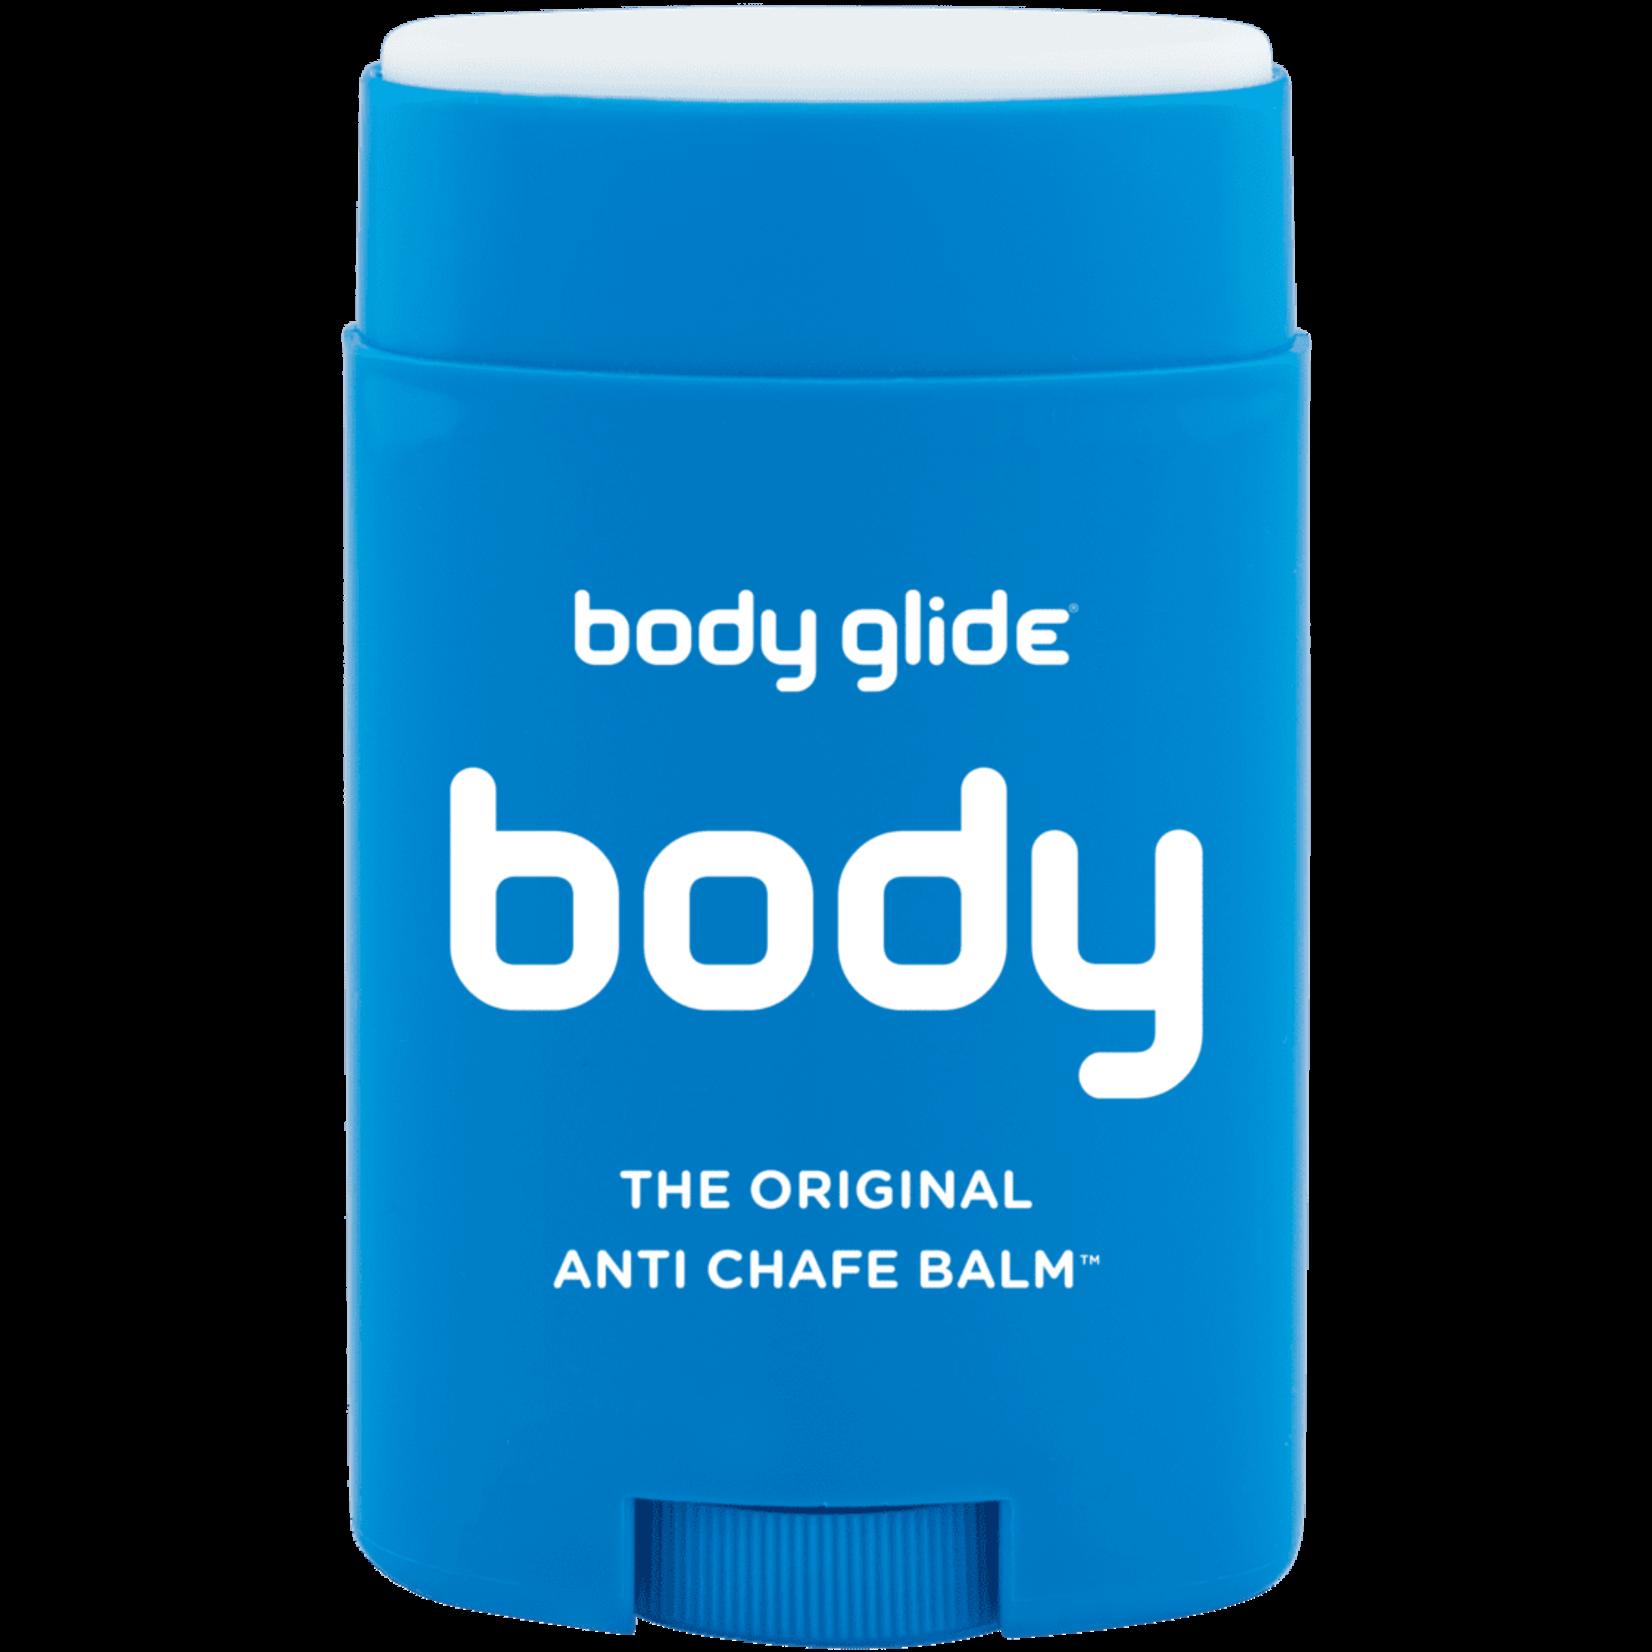 Body Glide BODY GLIDE BODY